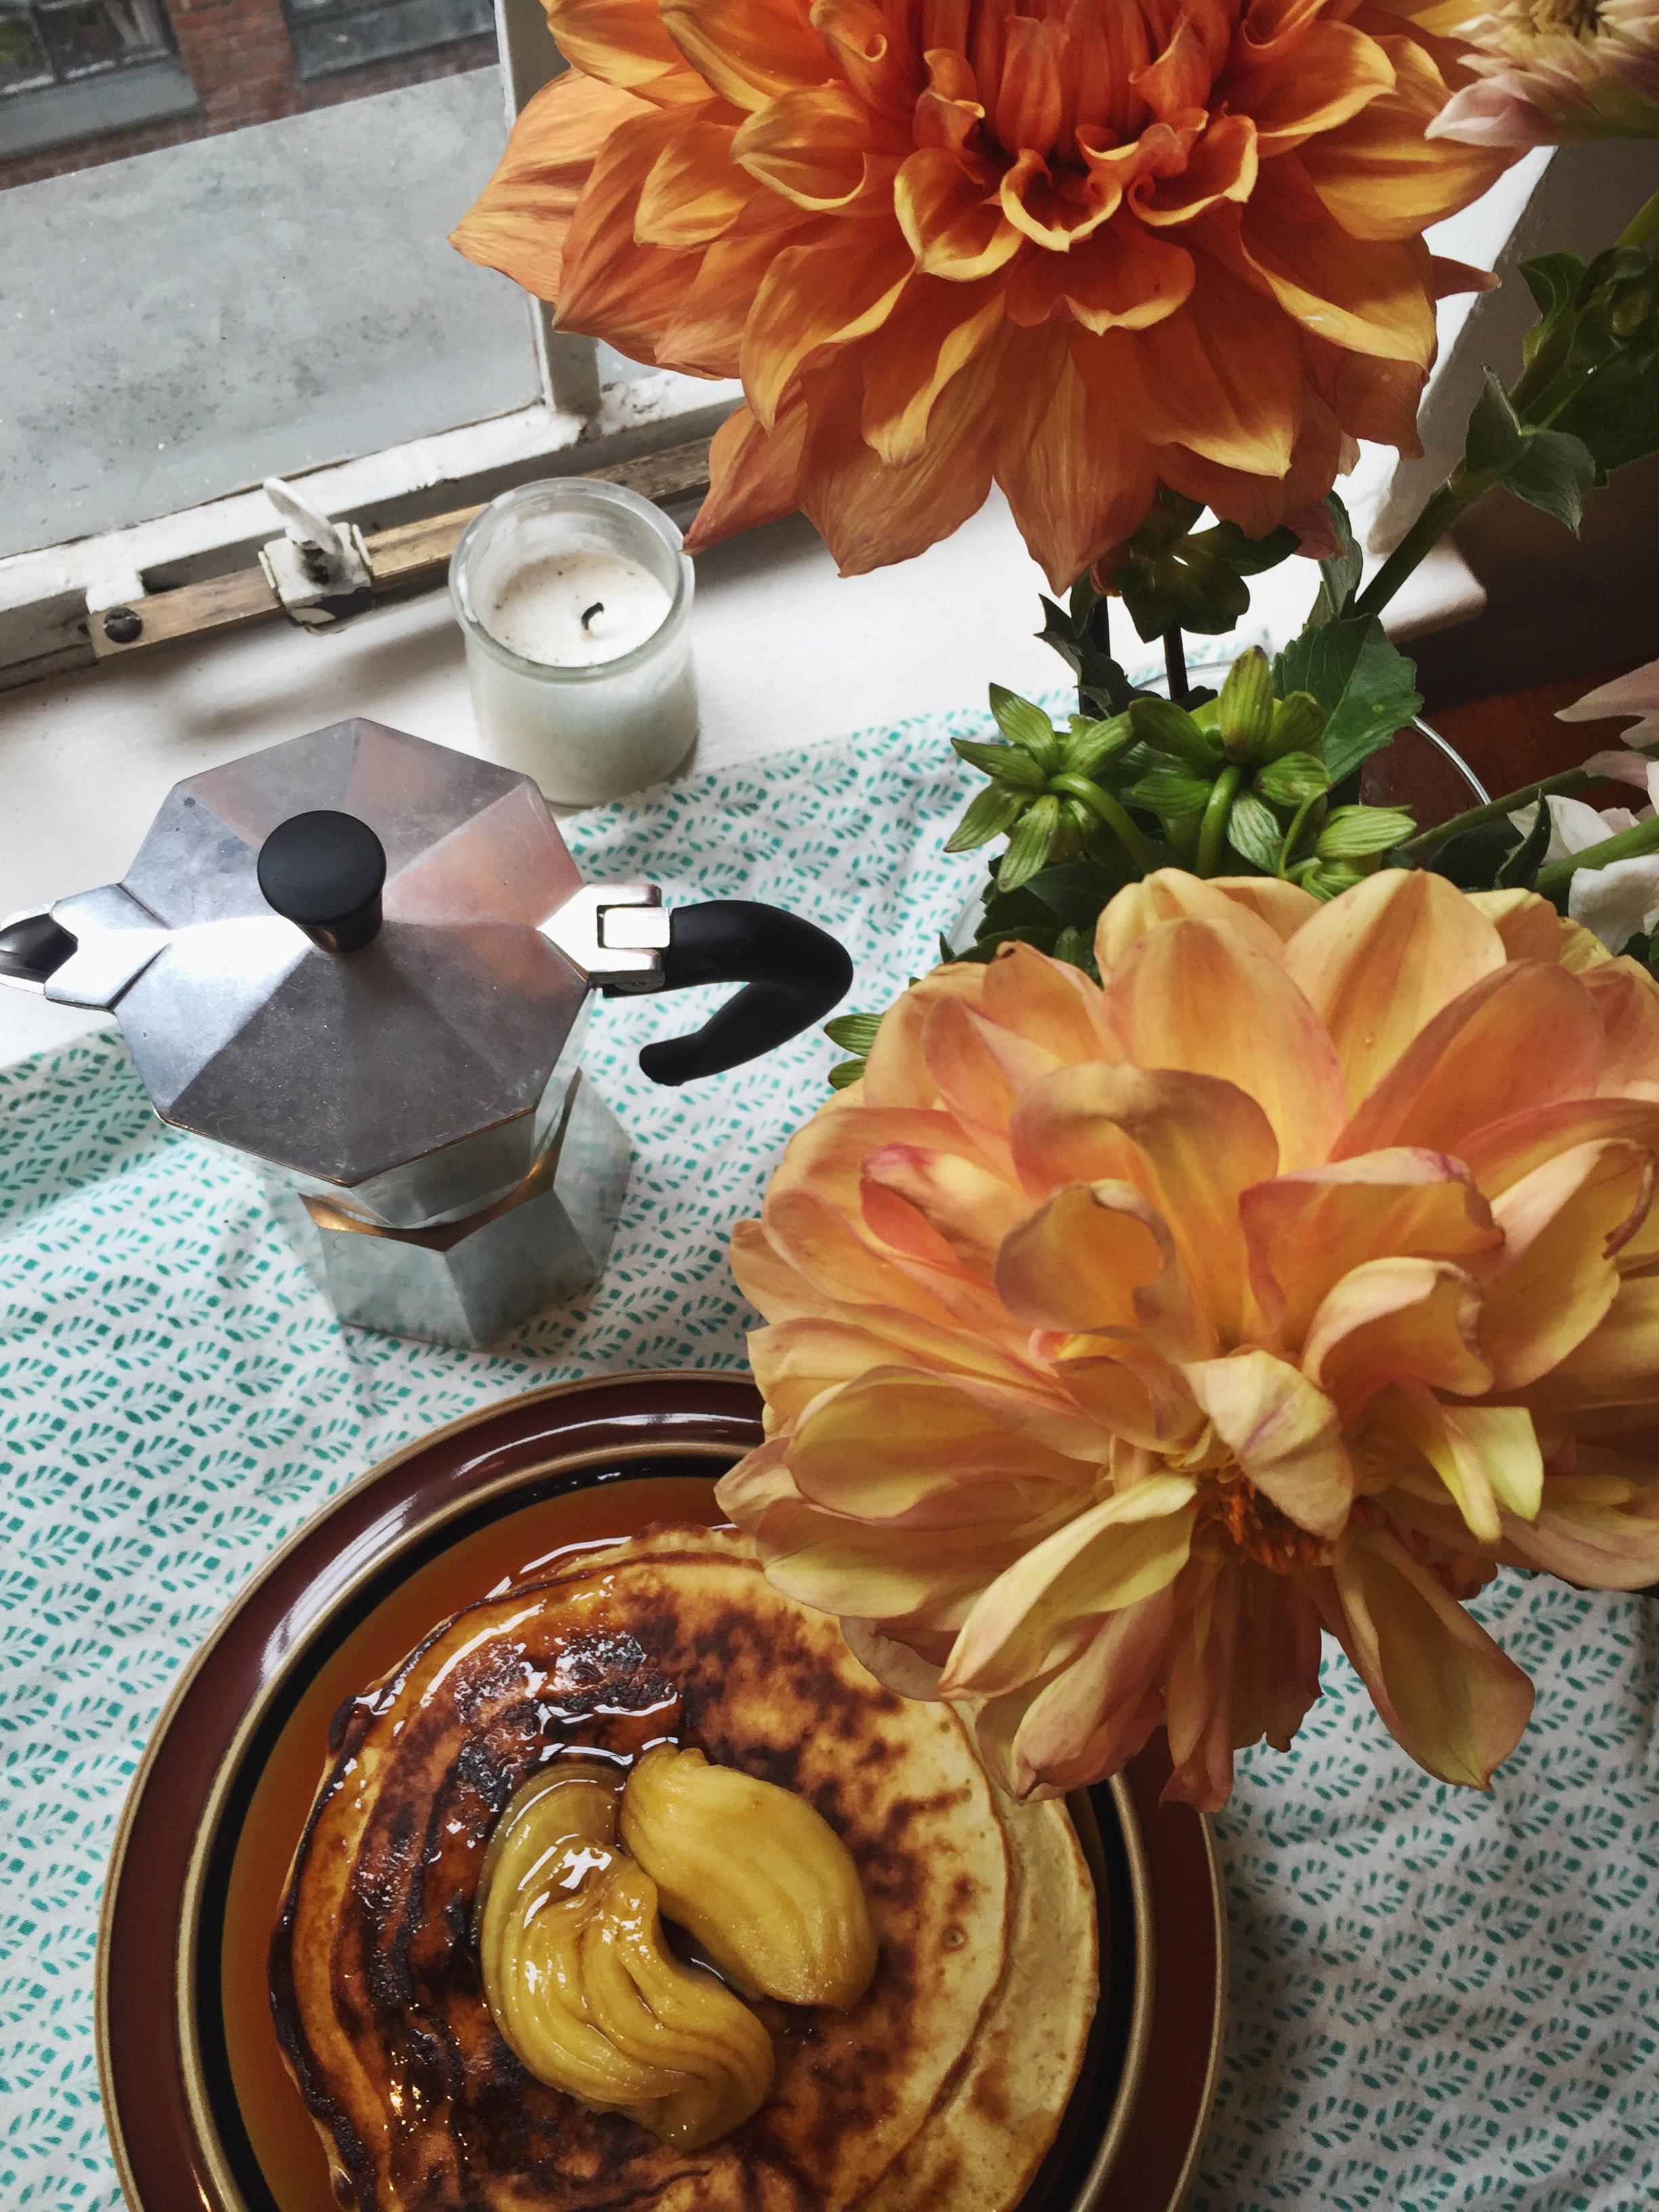 clinton-street-baking-co-pancake-maple-syrup-flowers